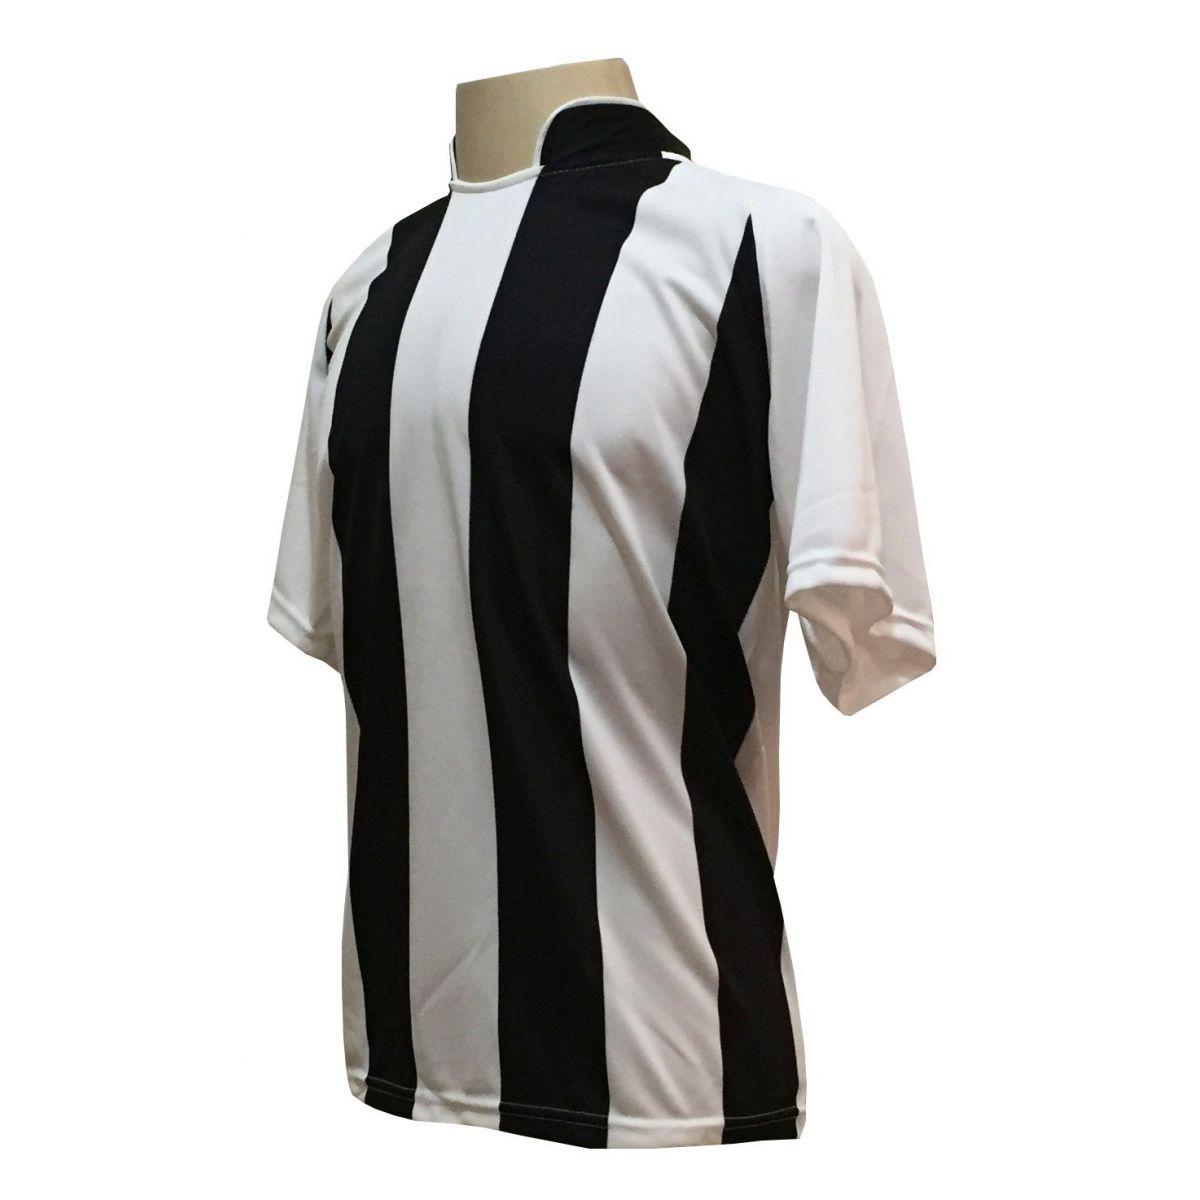 Fardamento Completo modelo Milan 18+1 (18 Camisas Branco/Preto + 18 Calções Copa Preto/Branco + 18 Pares de Meiões Preto + 1 Conjunto de Goleiro) + Brindes